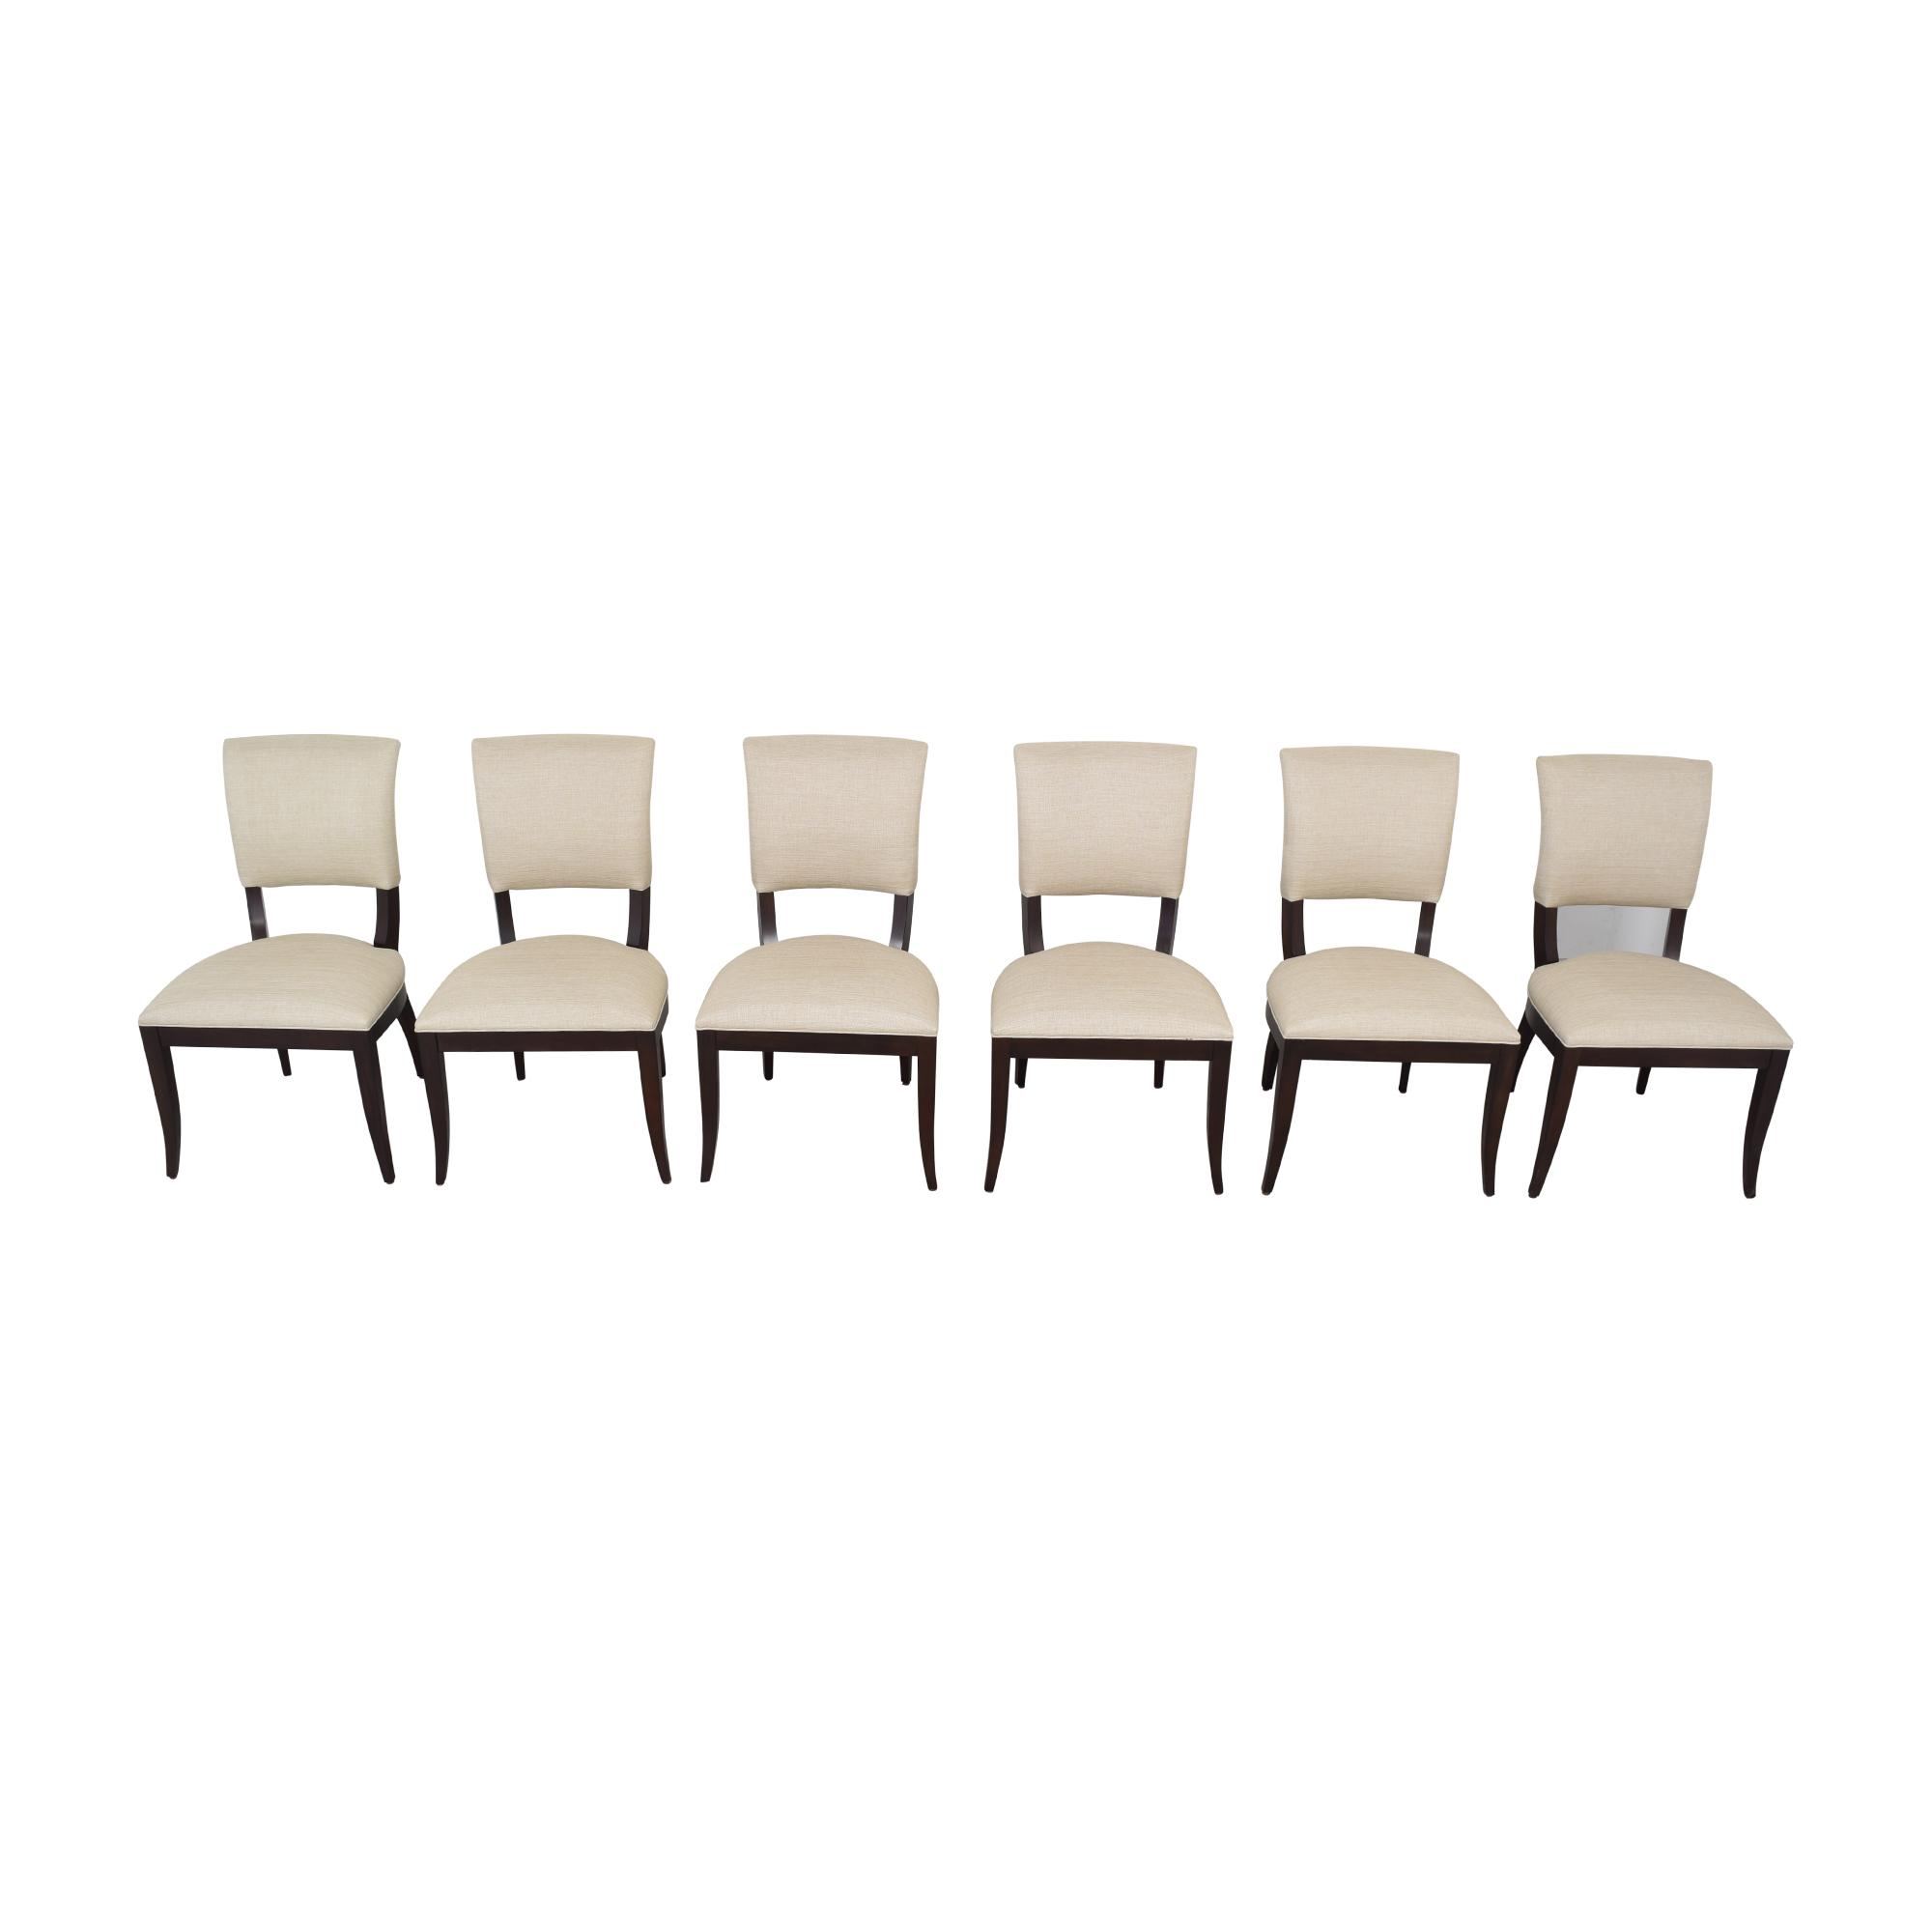 Ethan Allen Ethan Allen Drew Side Chairs